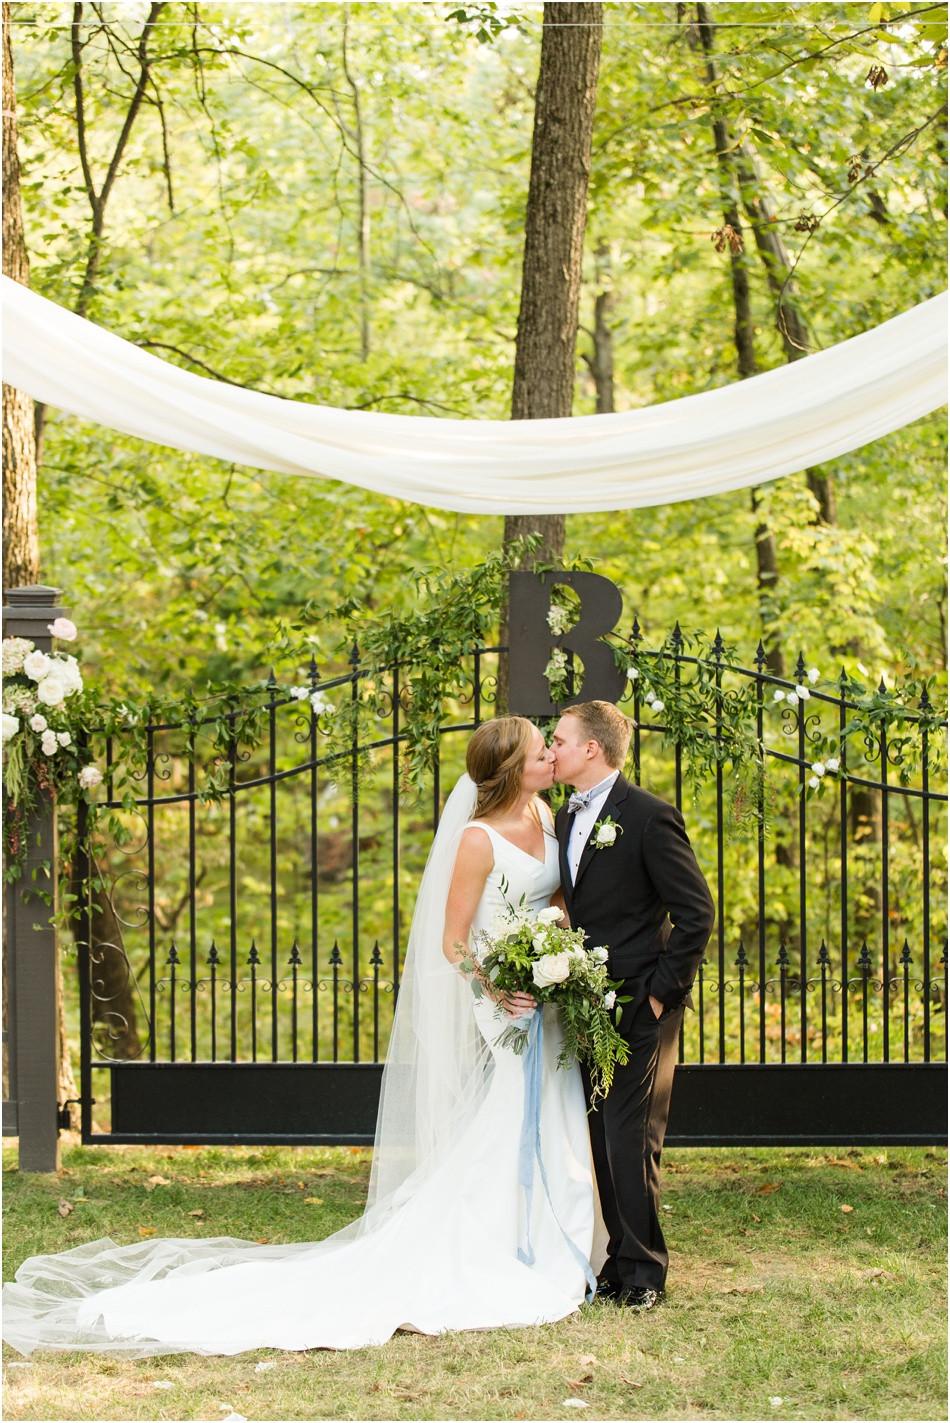 The-Bluffs-At-Connor Prairie-Wedding-Ceremony